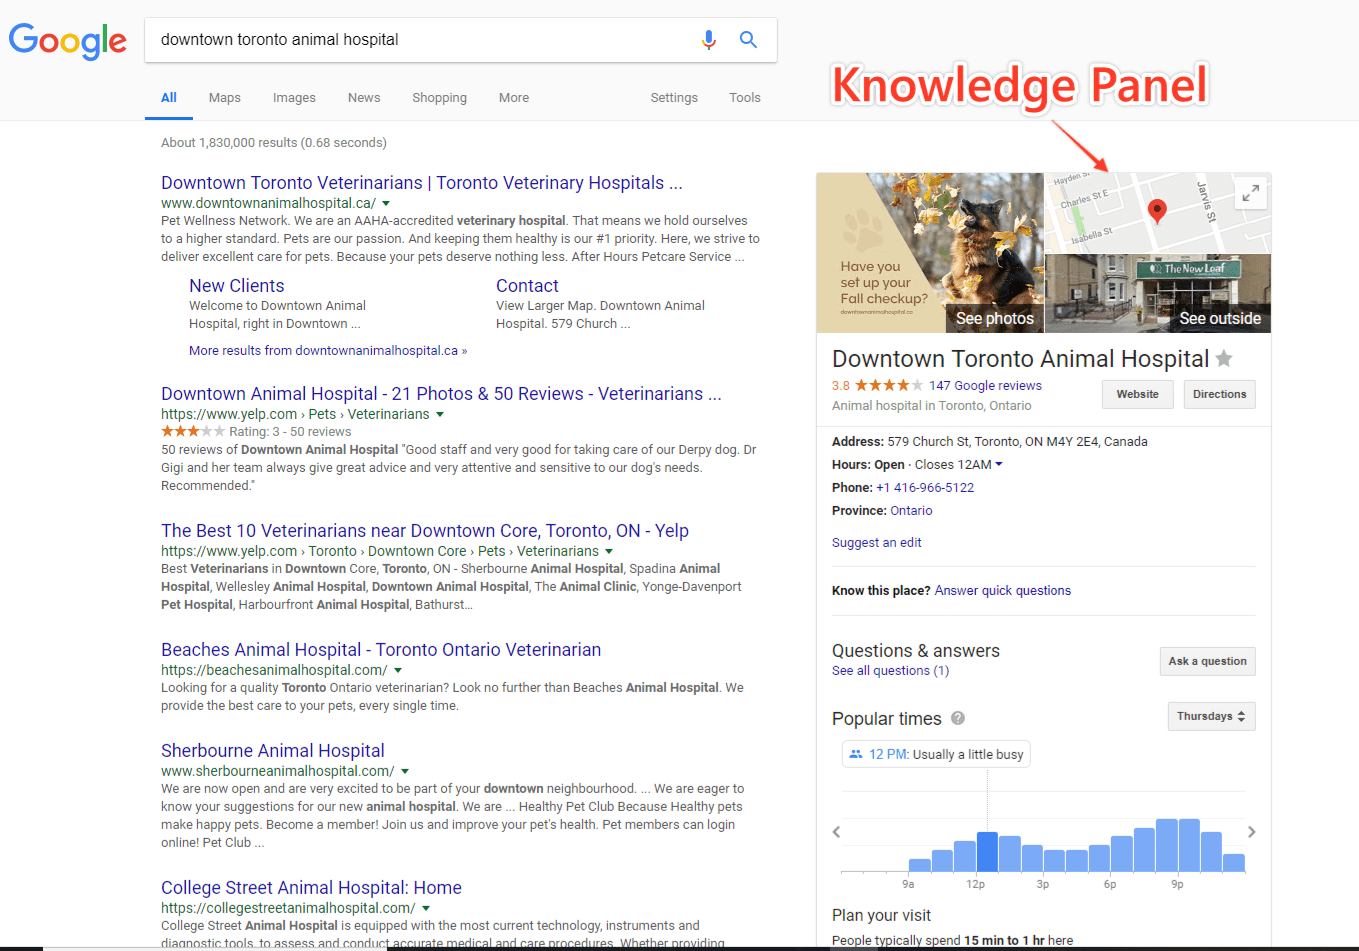 gmb knowledge panel